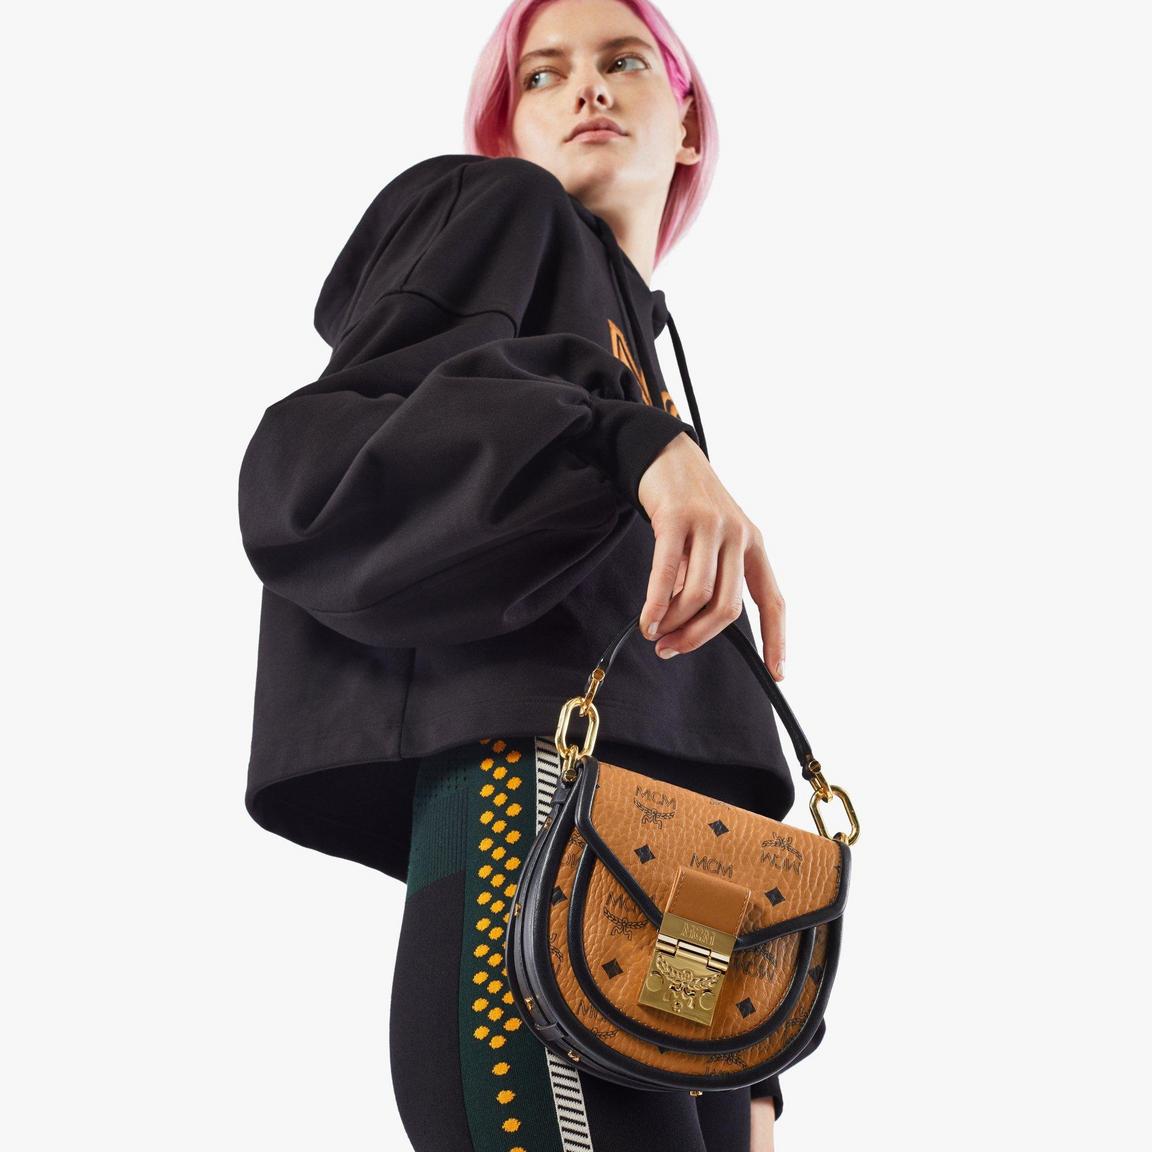 Patricia Shoulder Bag in Visetos Leather Block